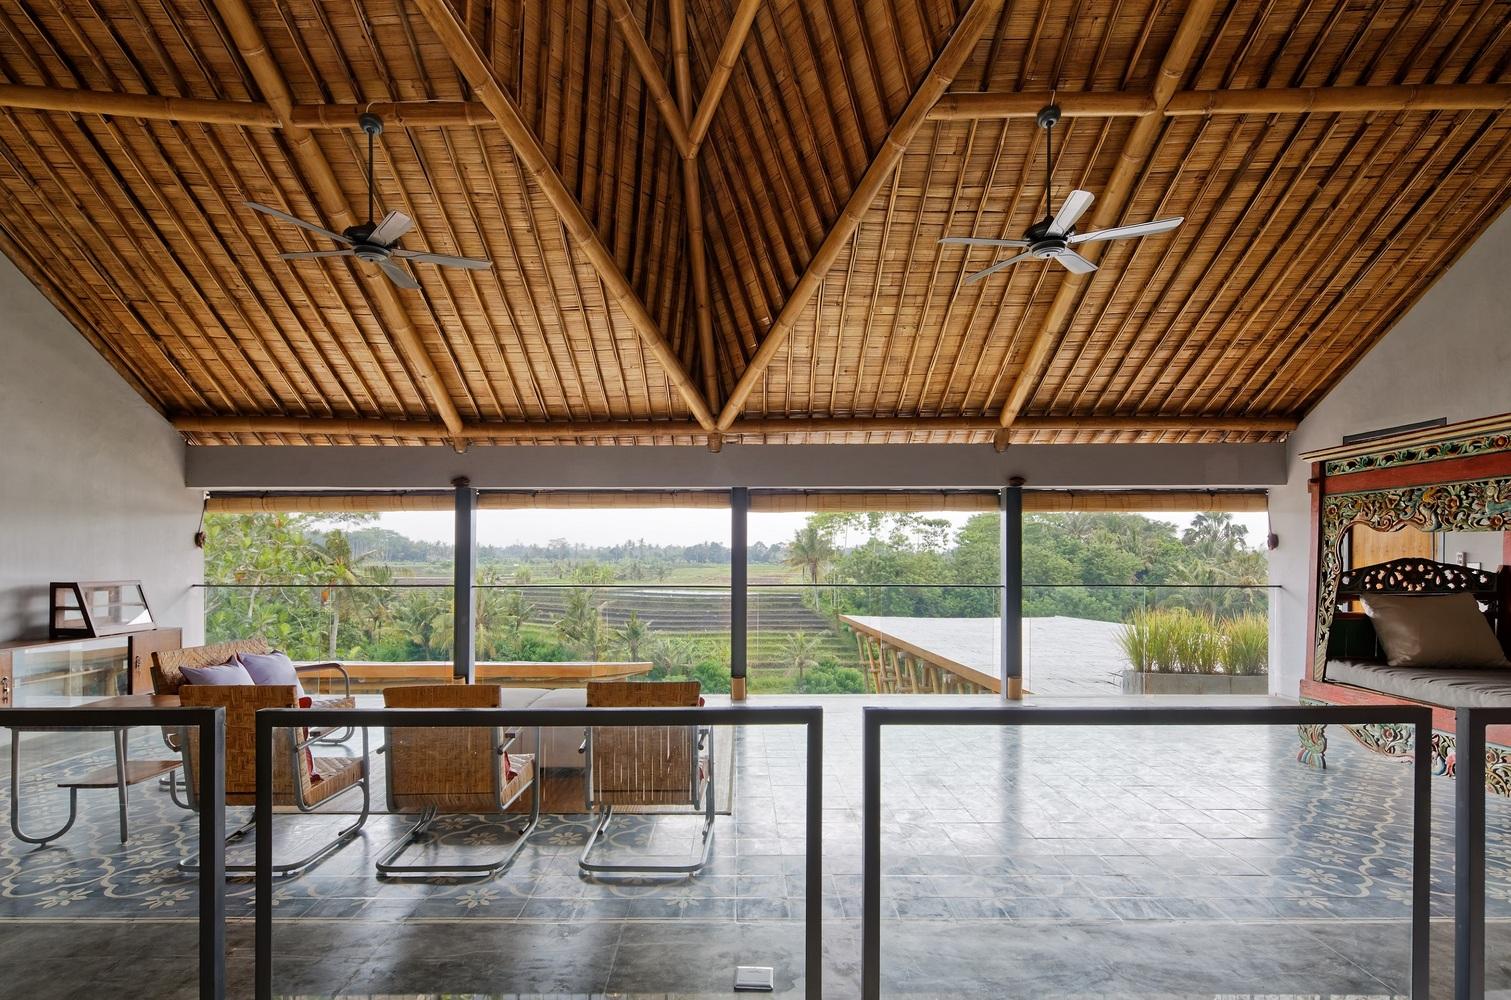 Permainan Arsitektur Bambu untuk Rumah Modern Super Keren ala Budi Pradono | Foto artikel Arsitag